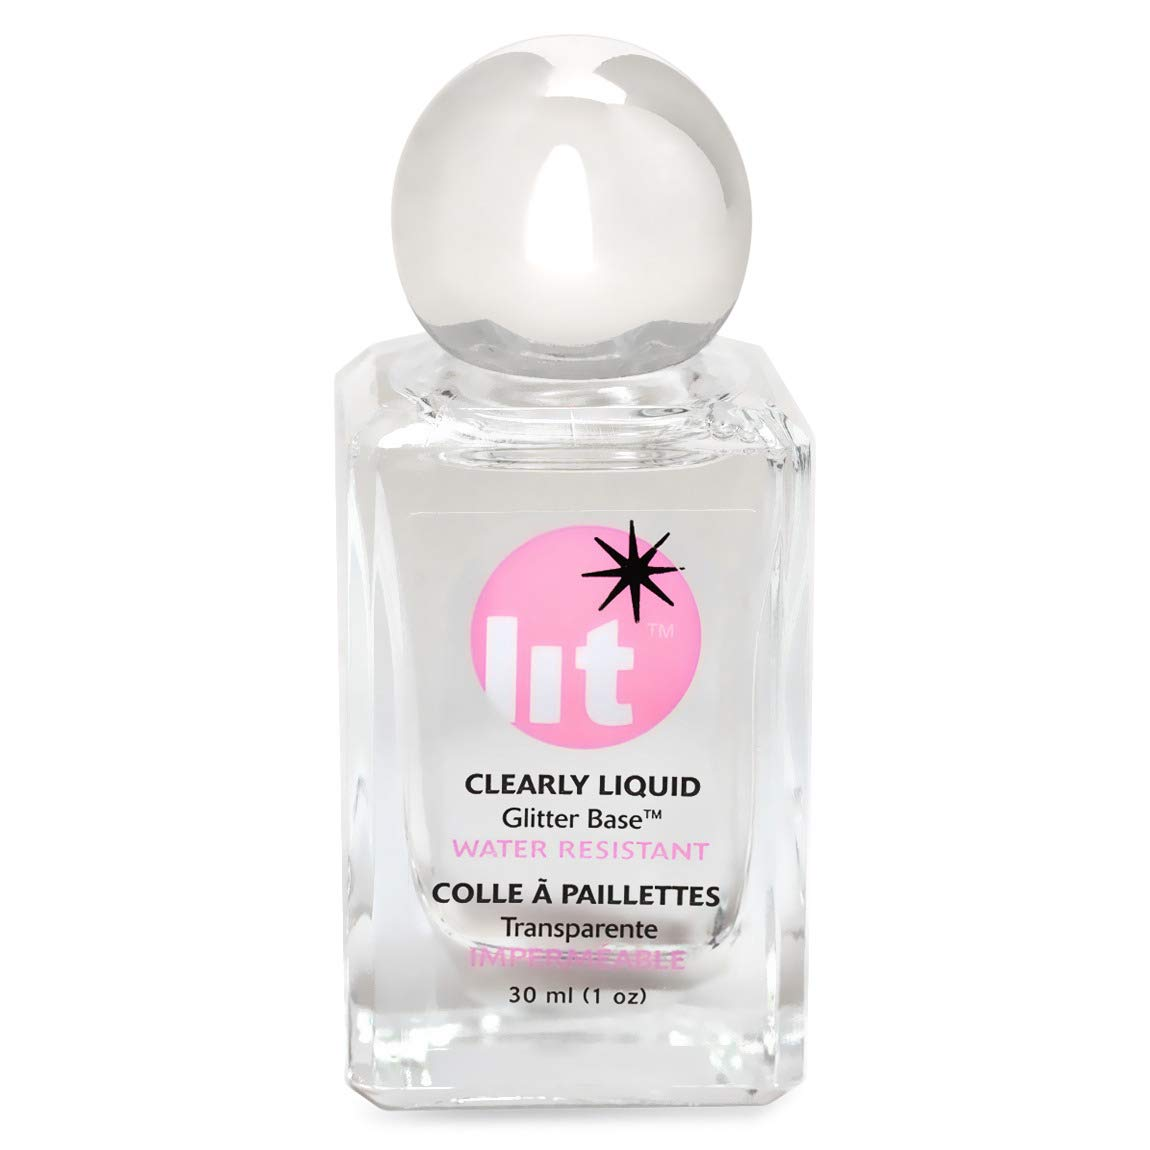 Lit Cosmetics Water Resistant Glitter Base - 1 Oz by Lit